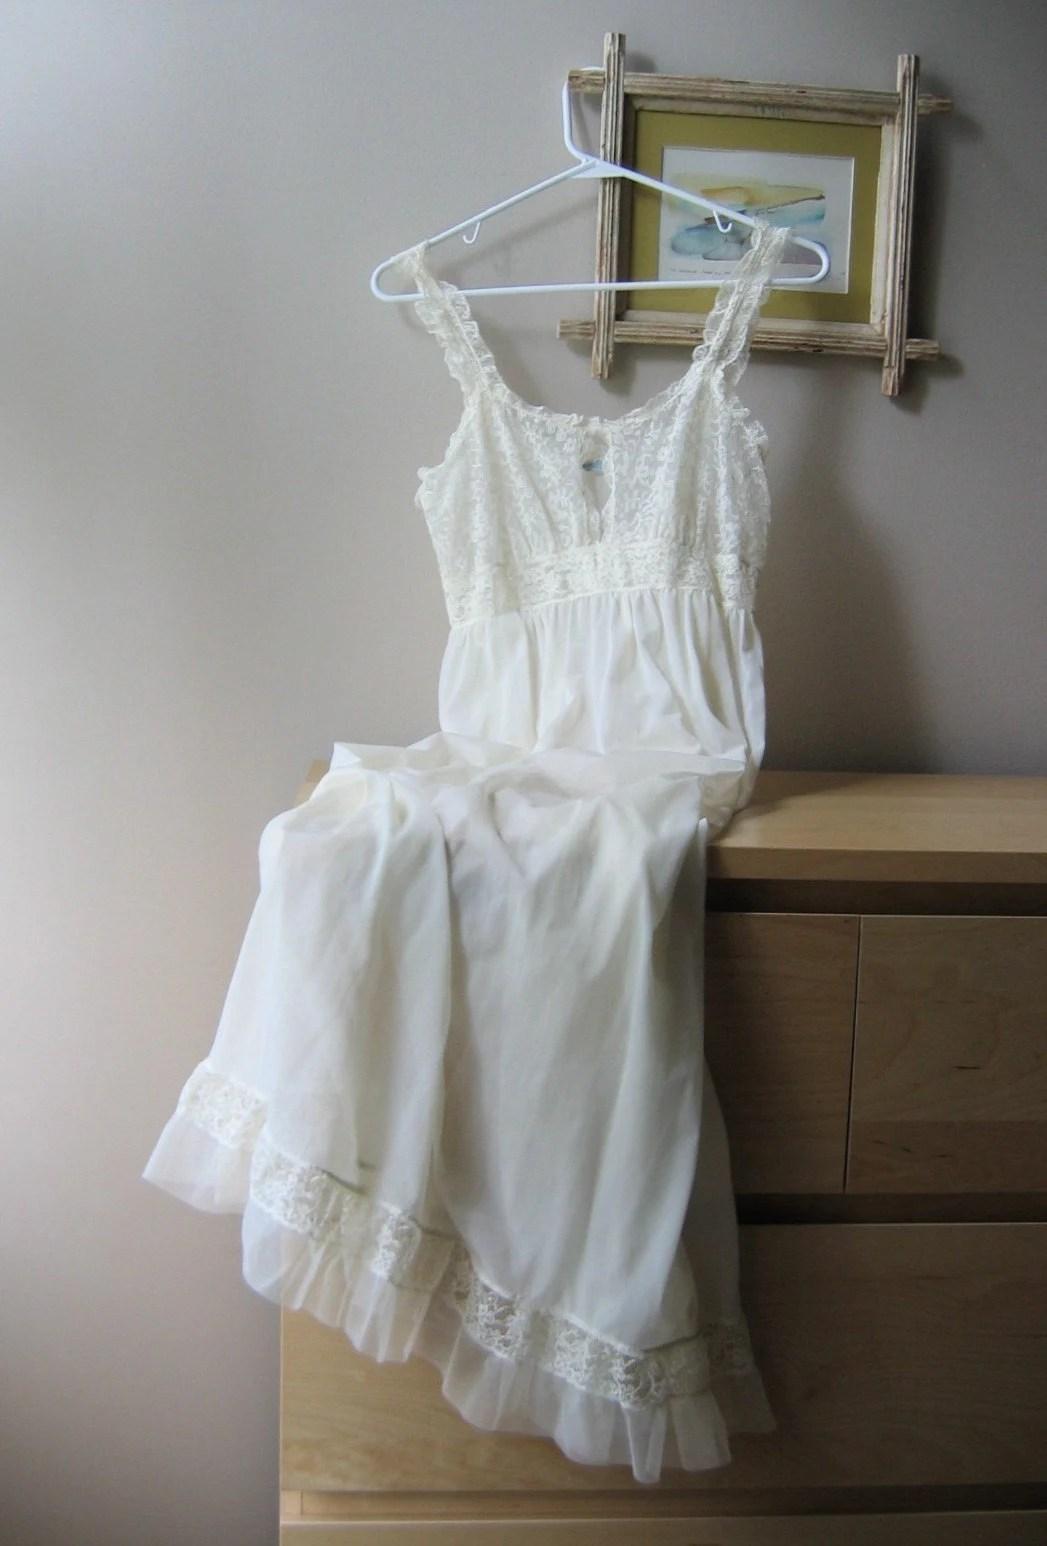 SALE Vintage Ivory Peignoir Set Full Length Bridal Nightgown